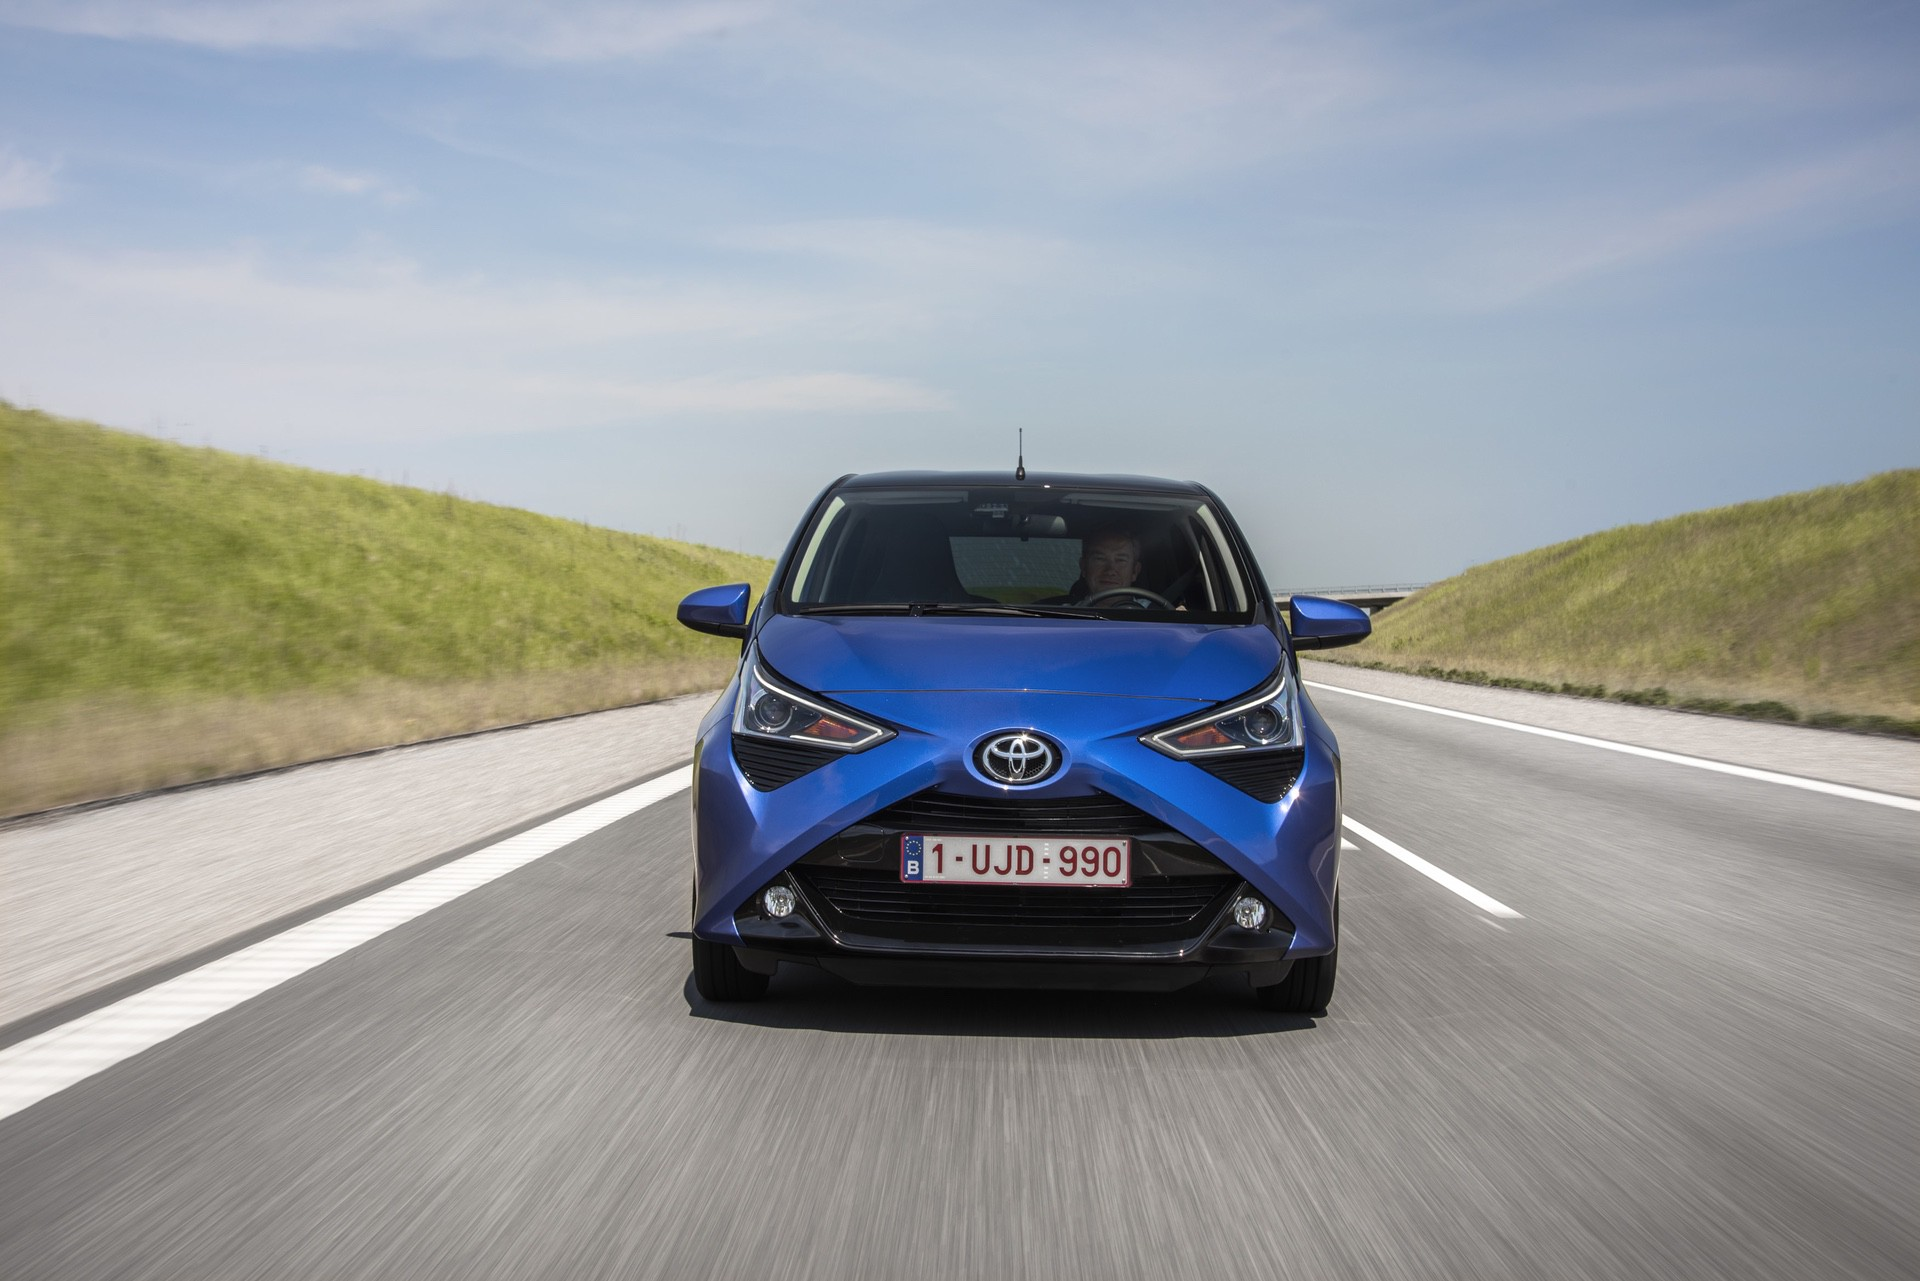 Toyota_Aygo_facelift_presskit_0007